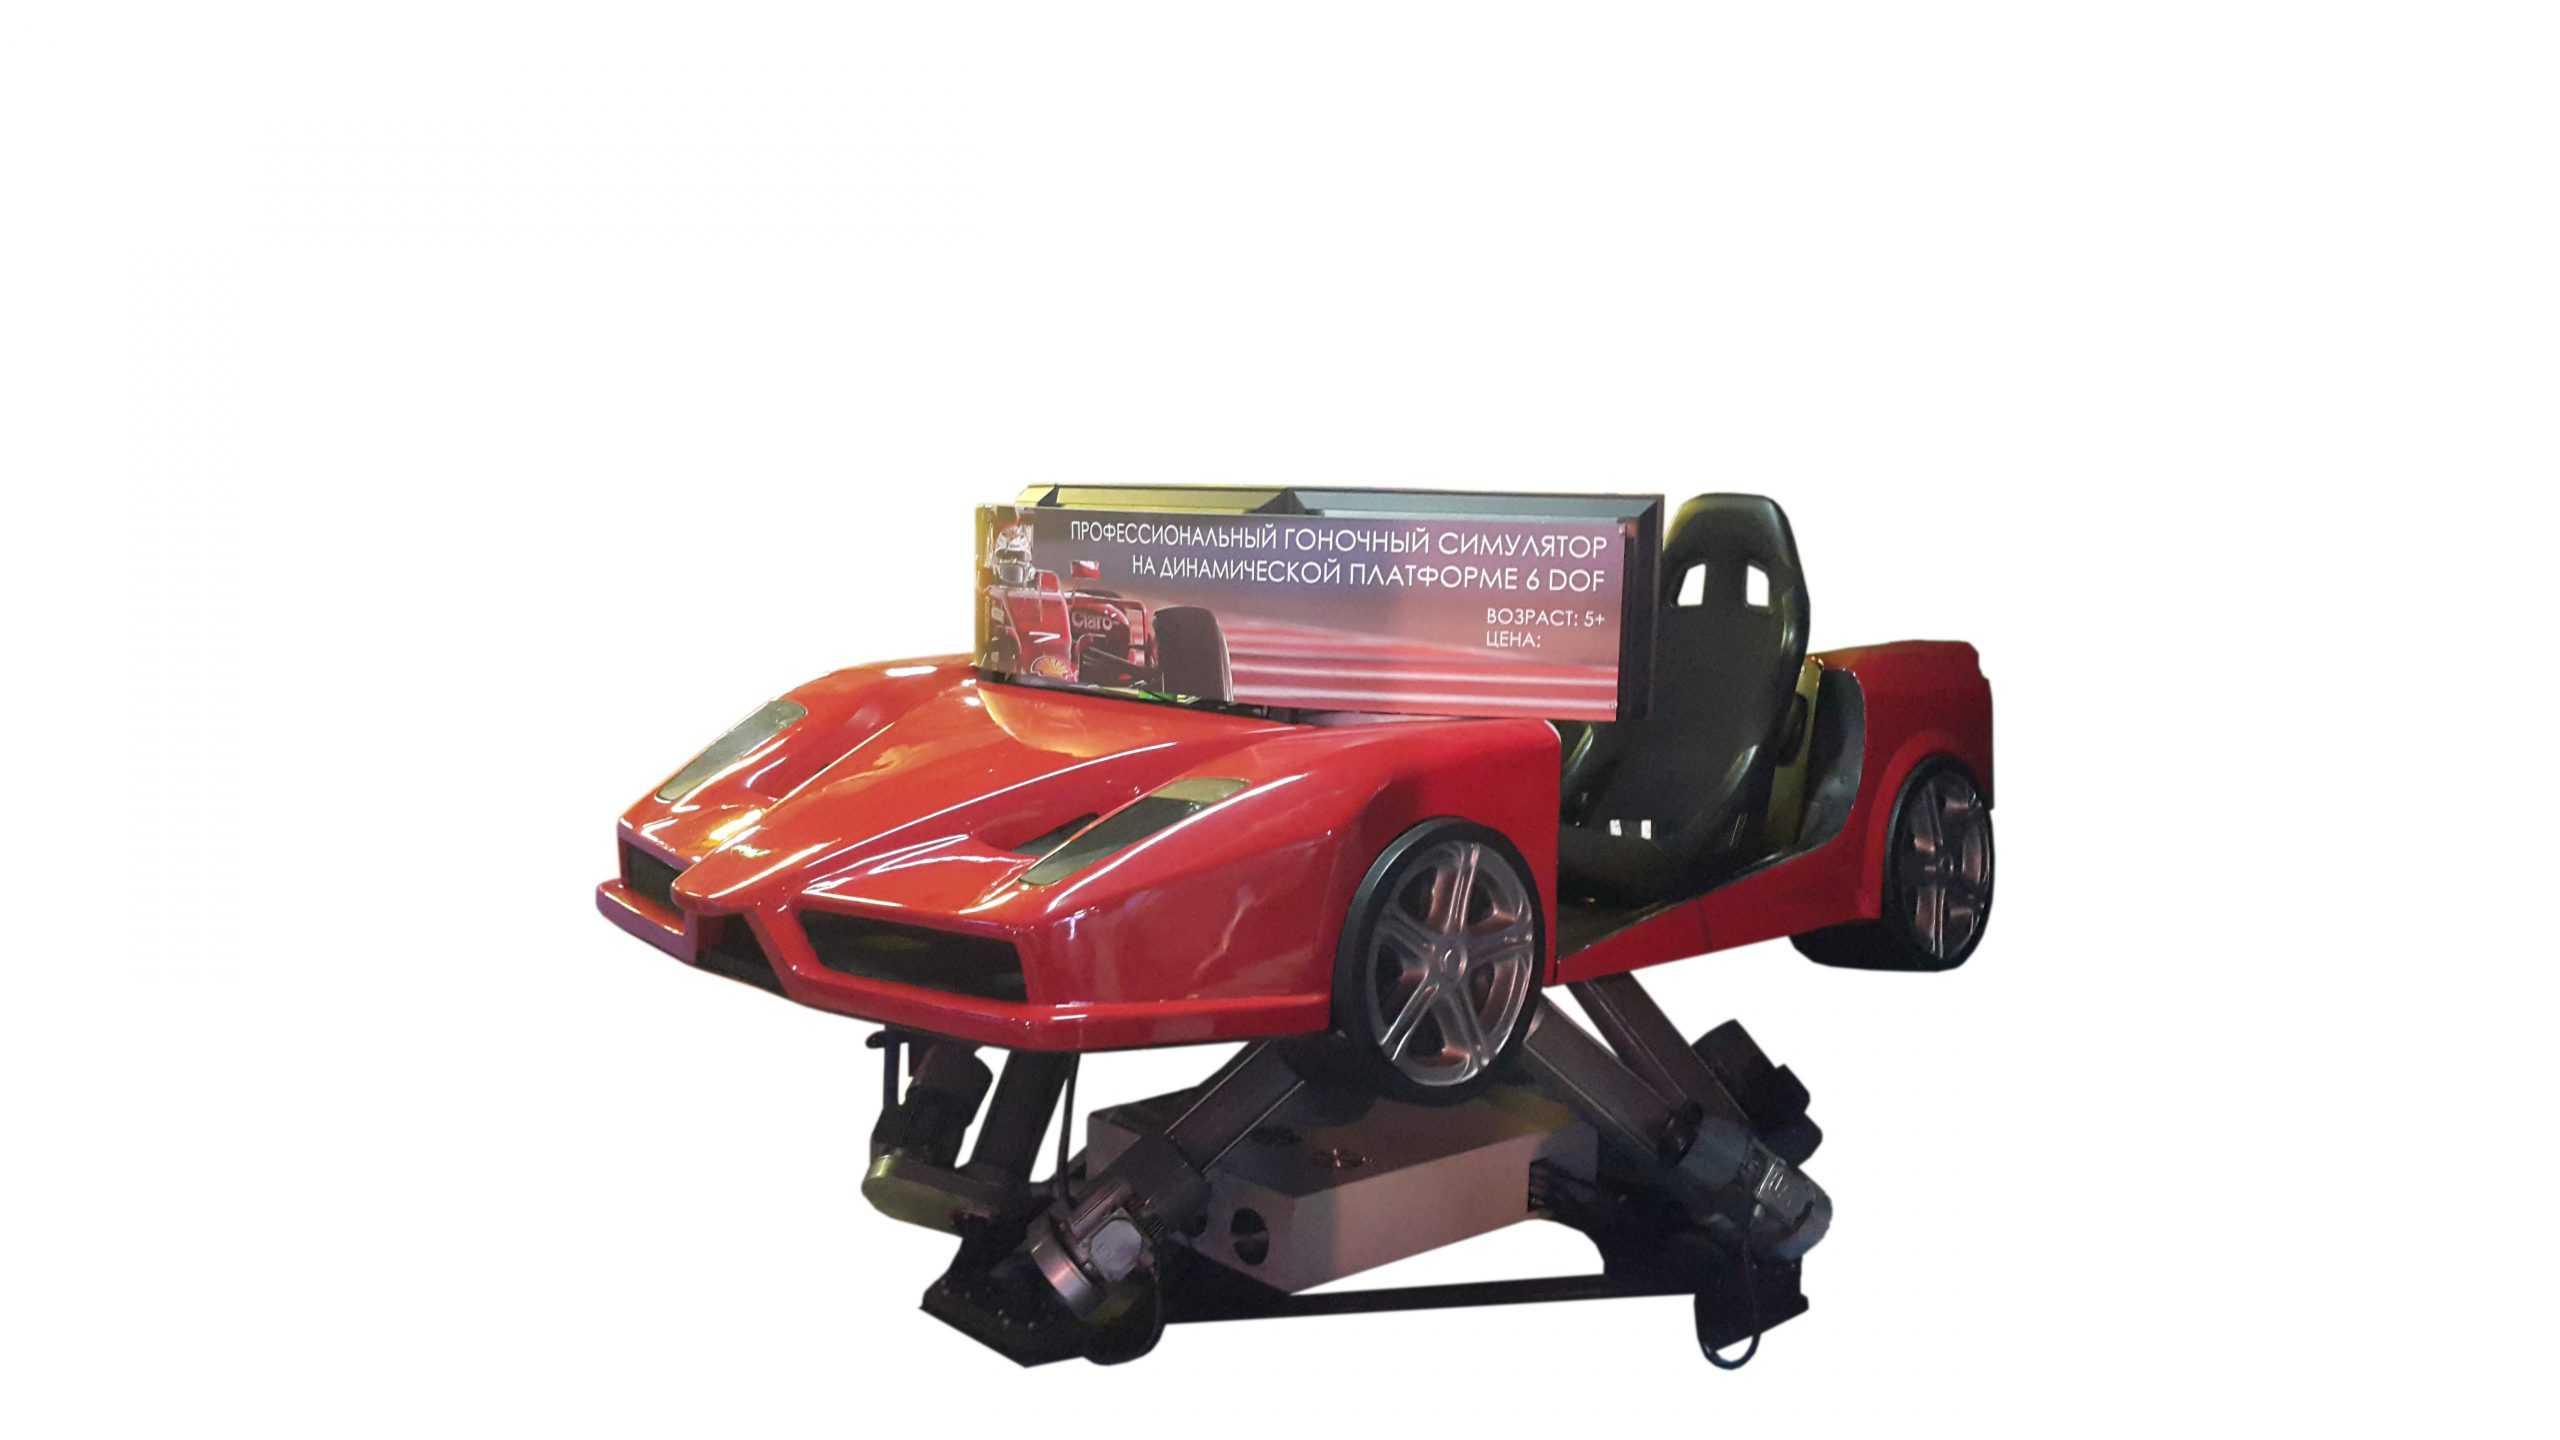 Ferrari_4 Full motion racing simulator 2dof, 3dof,4dof,6dof motion platform